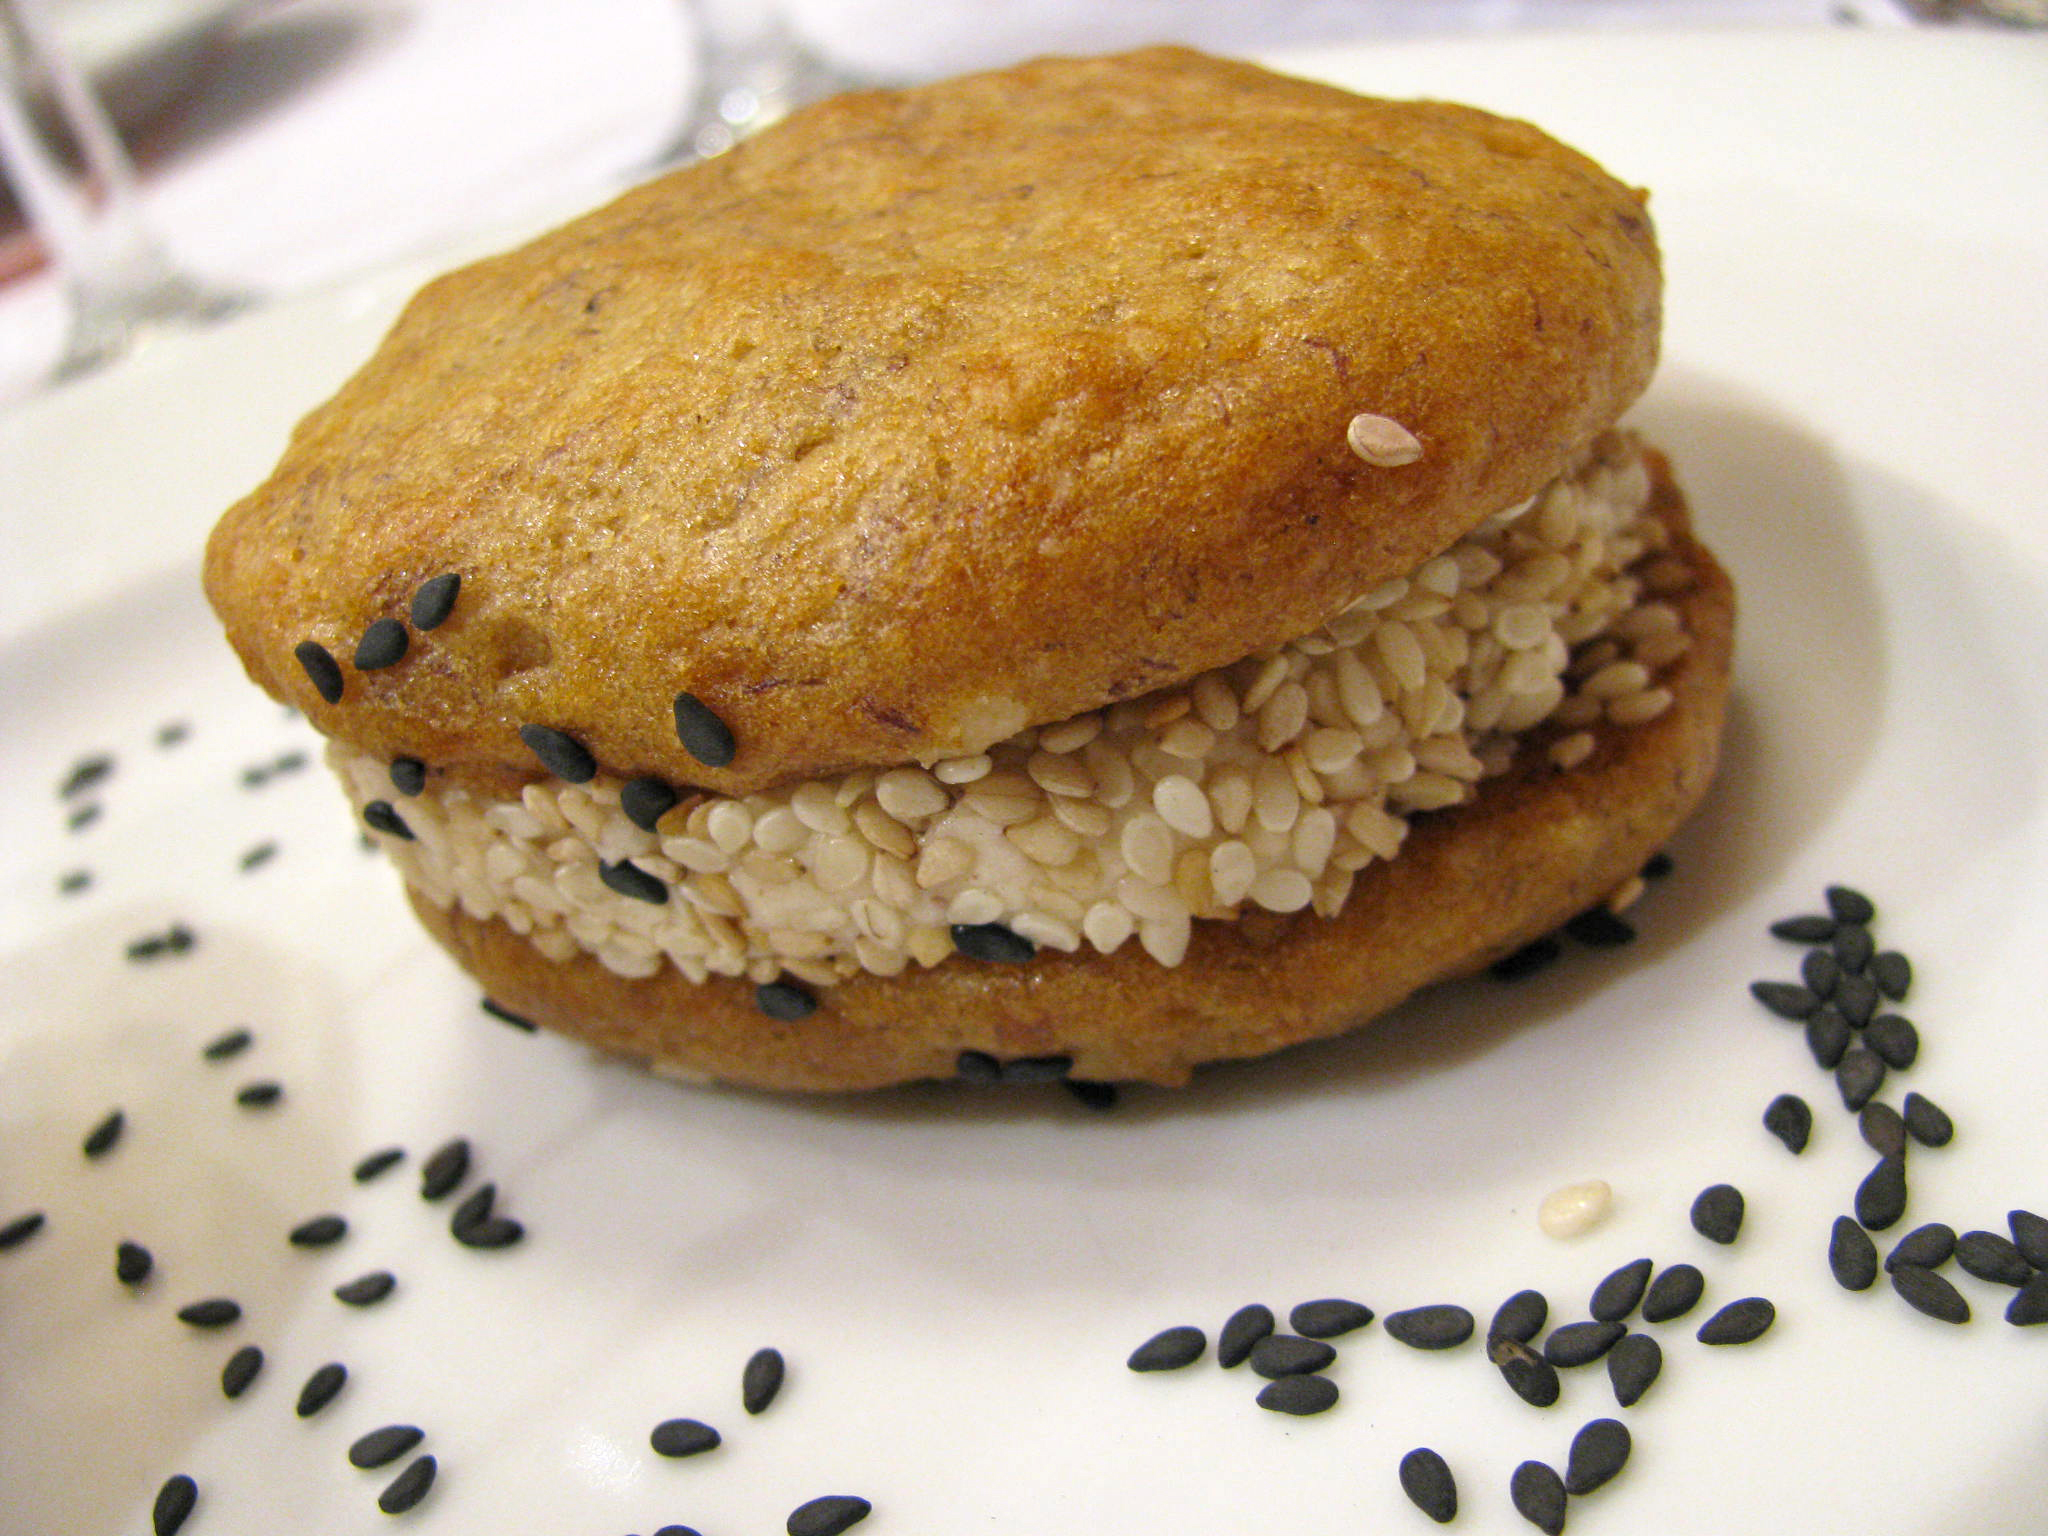 whoopie pie pattycake bakery columbus ohio dessert tour